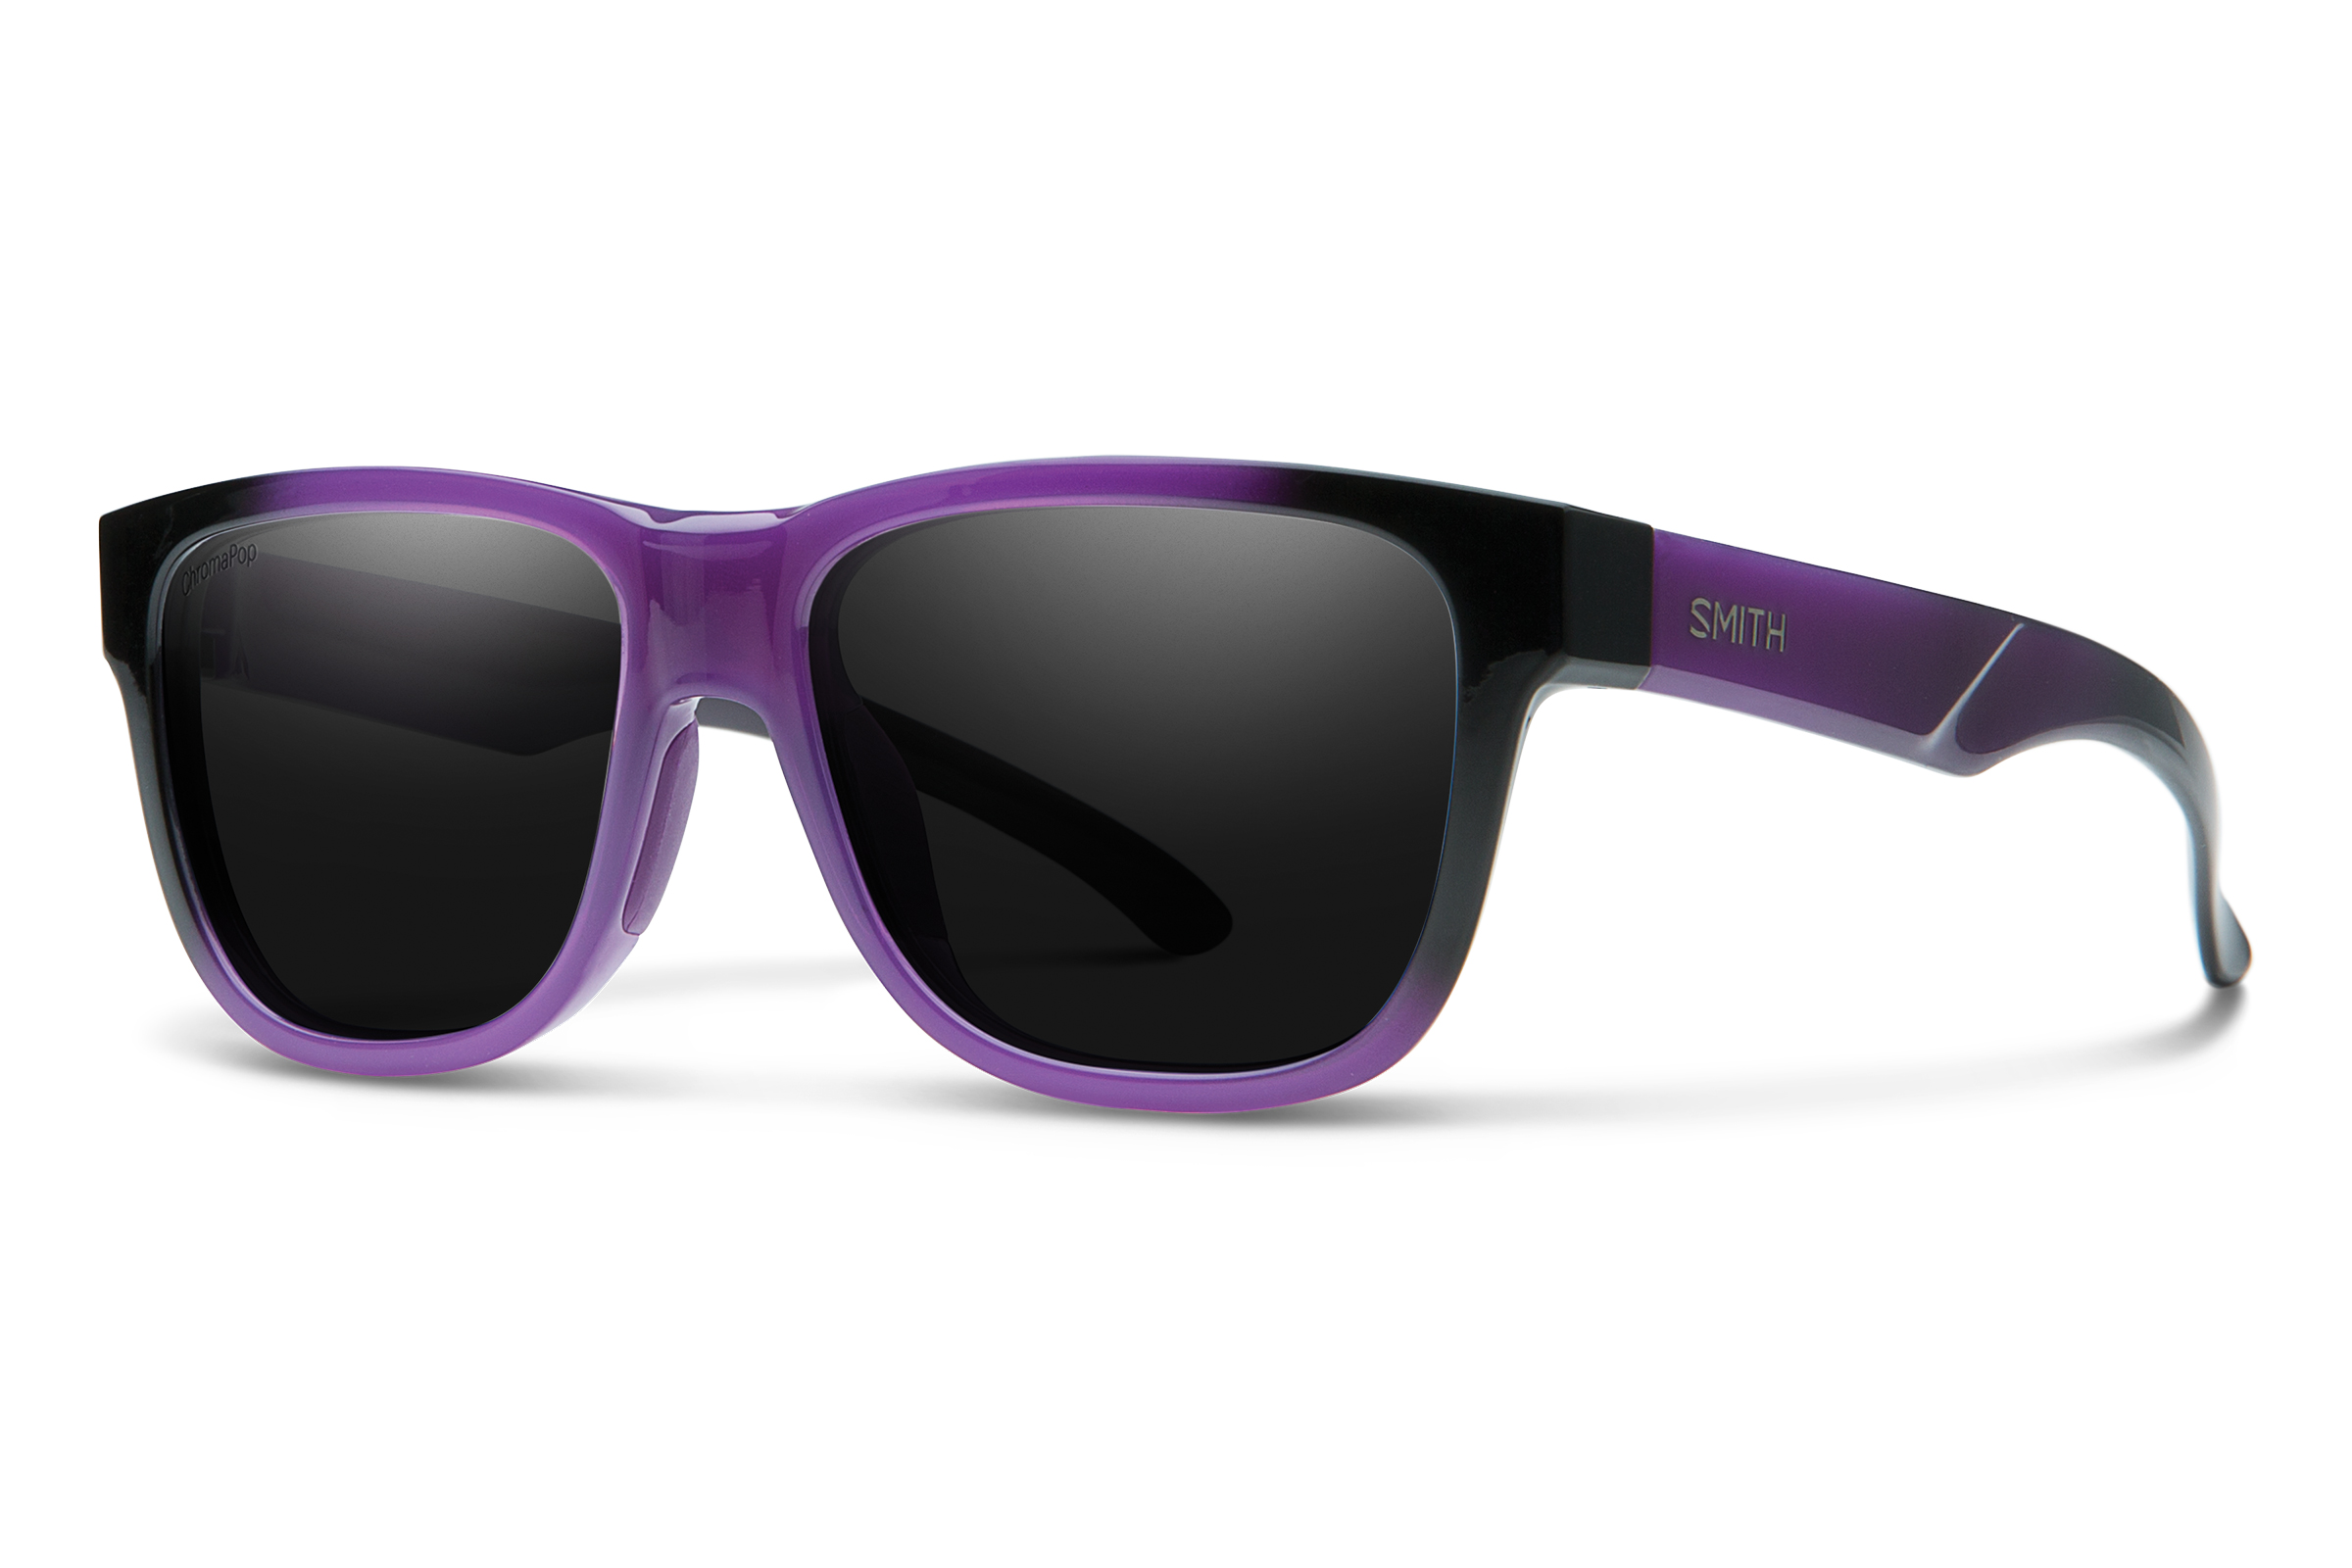 5688374db1 Smith Lowdown Slim 2 Chromapop Sunglasses -Men s